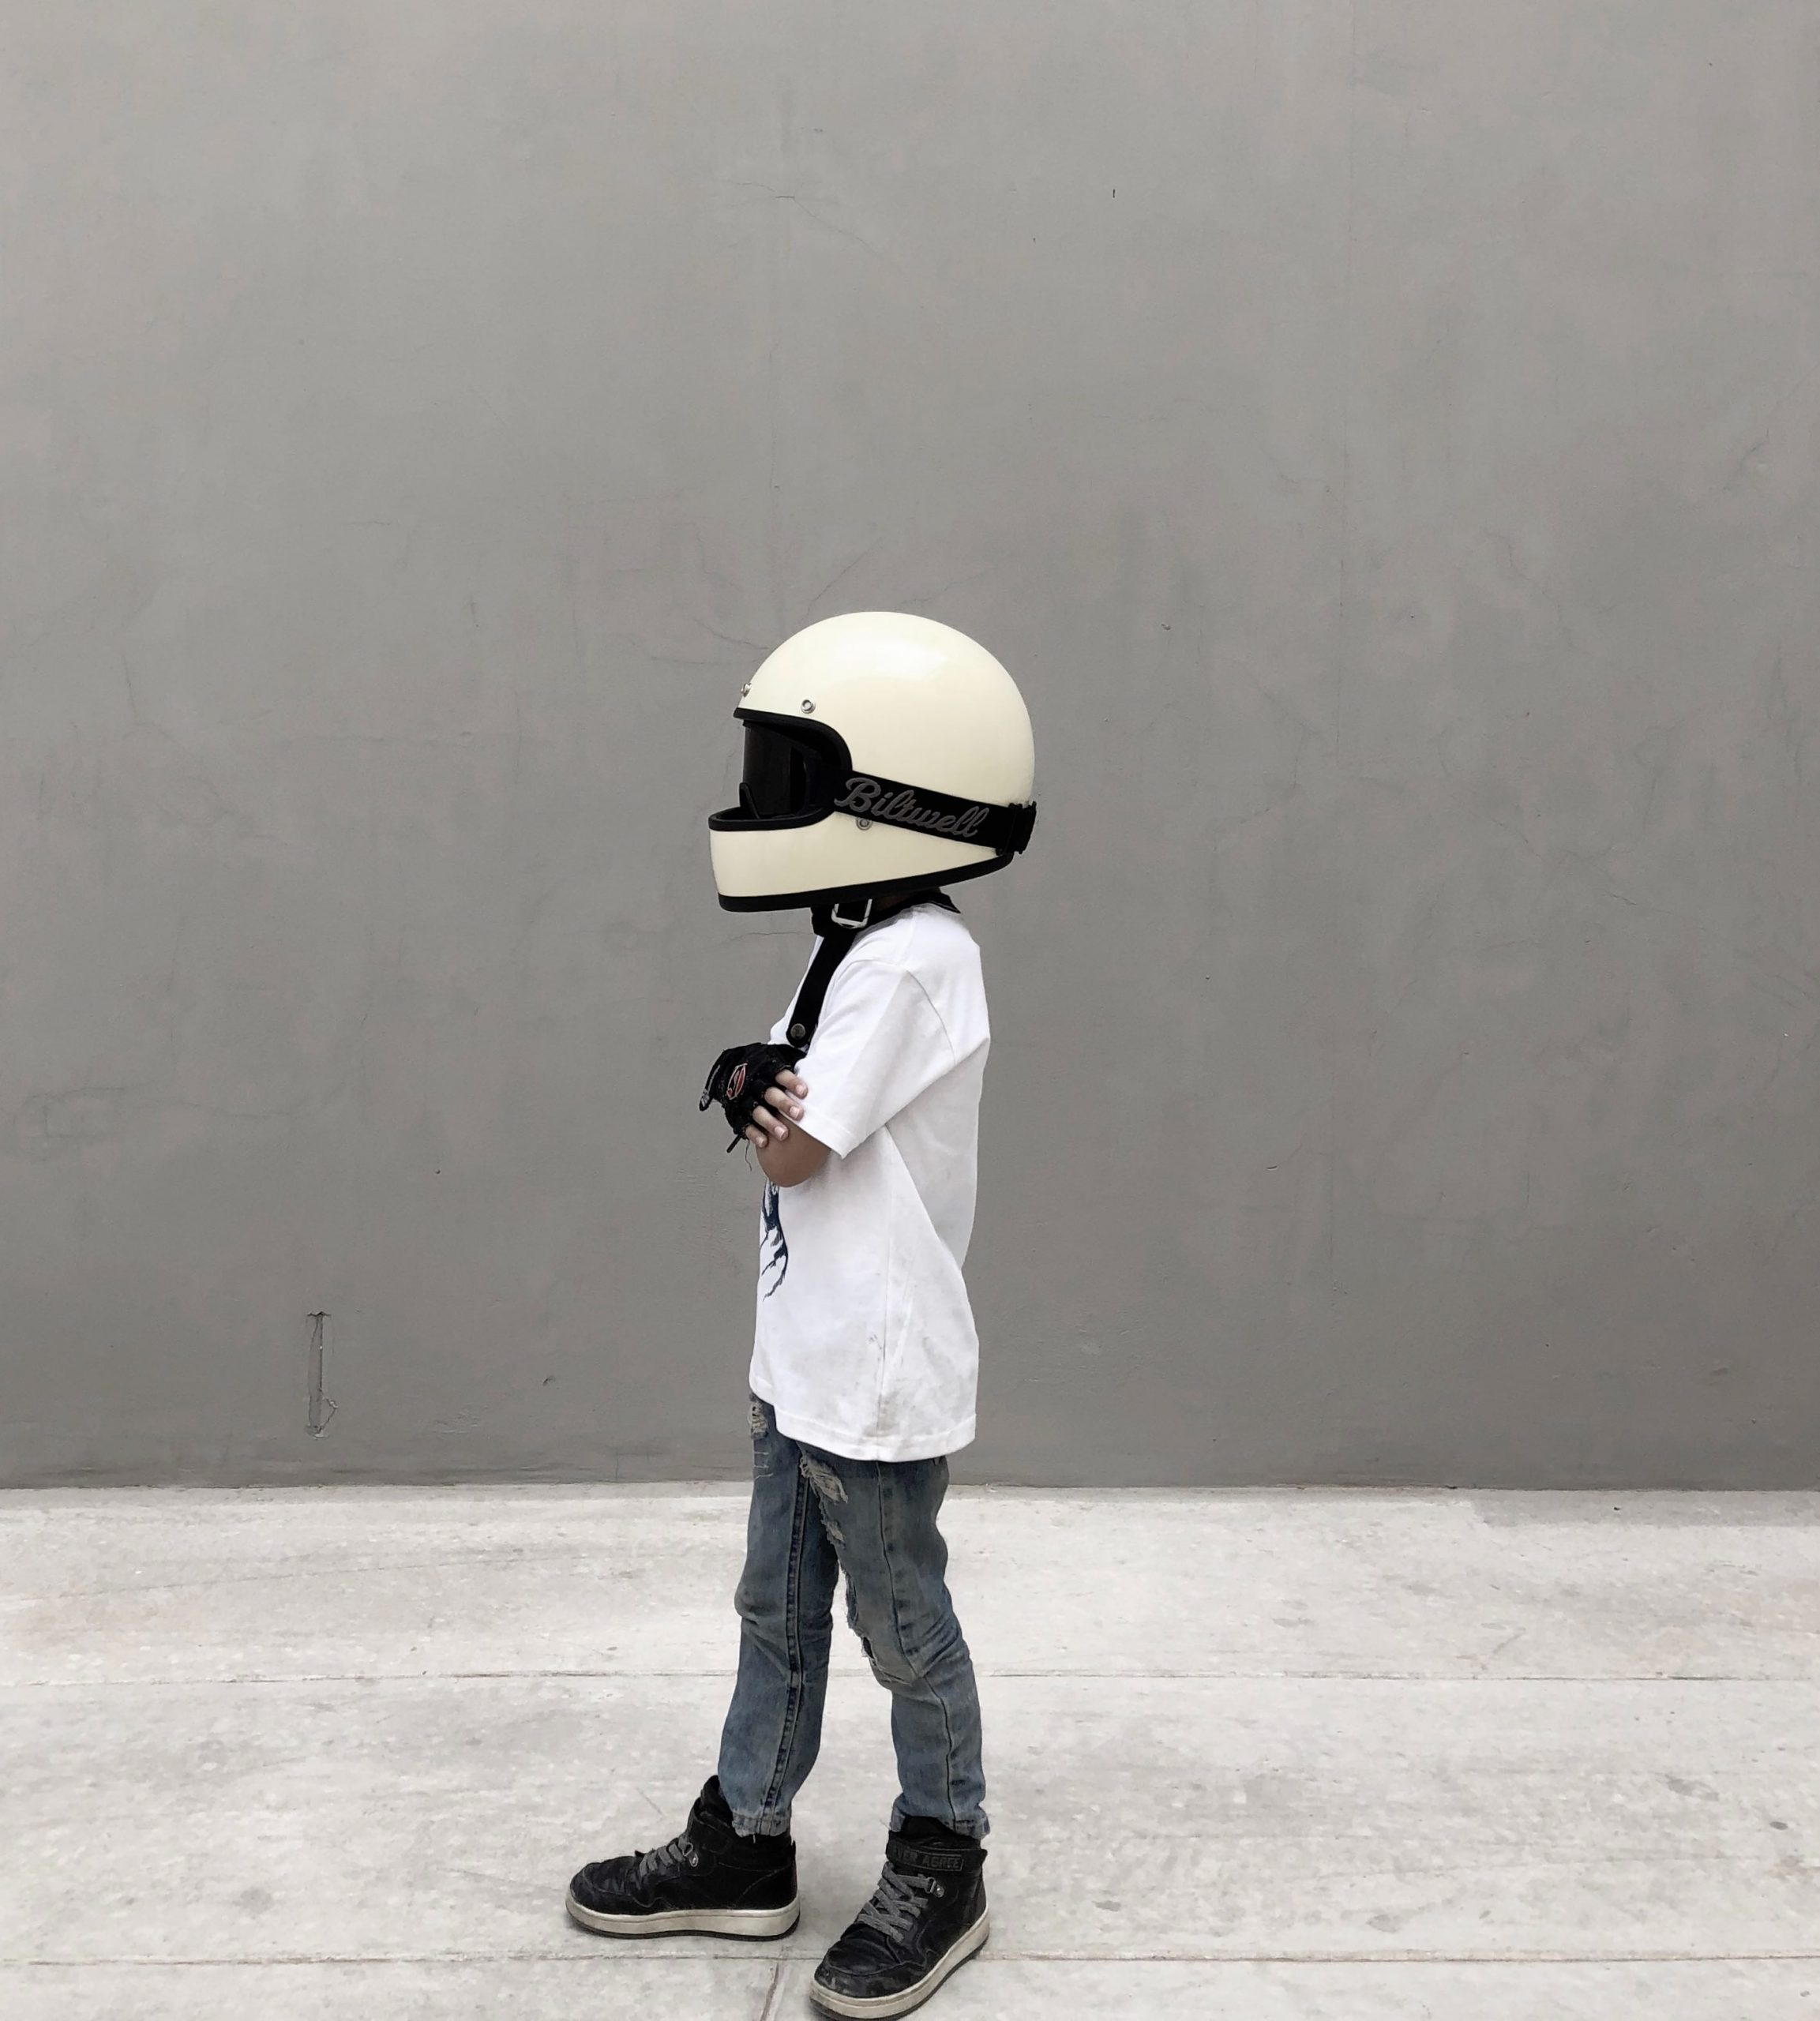 Mejores Ayudas infantiles en ortodinamics.com